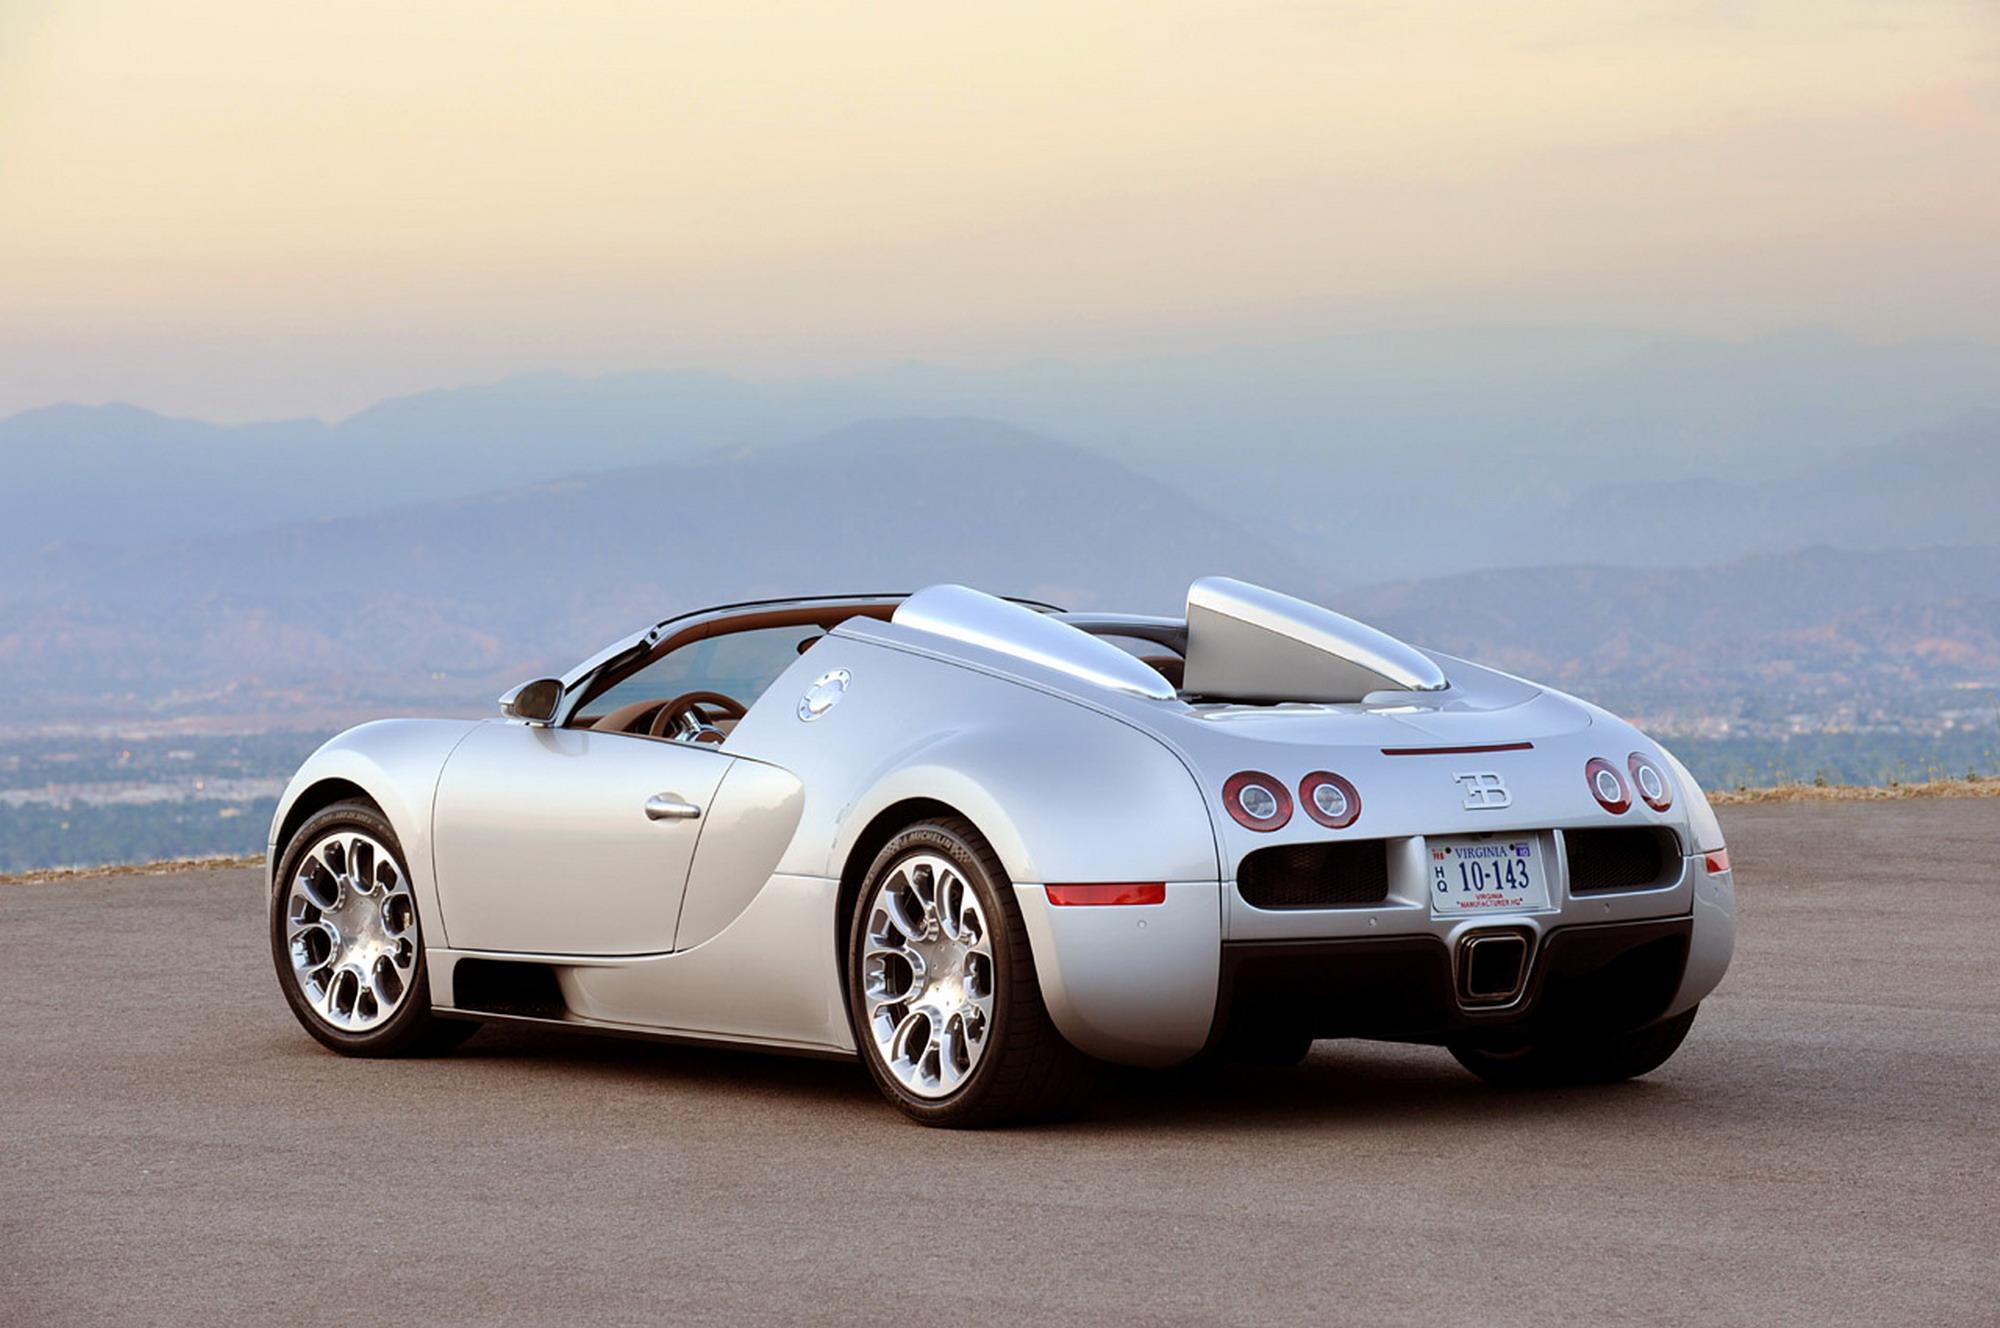 Bugatti Veyron Hypersport 2014-bugatti-veyron-hyper-sport-super-car | lux exposé